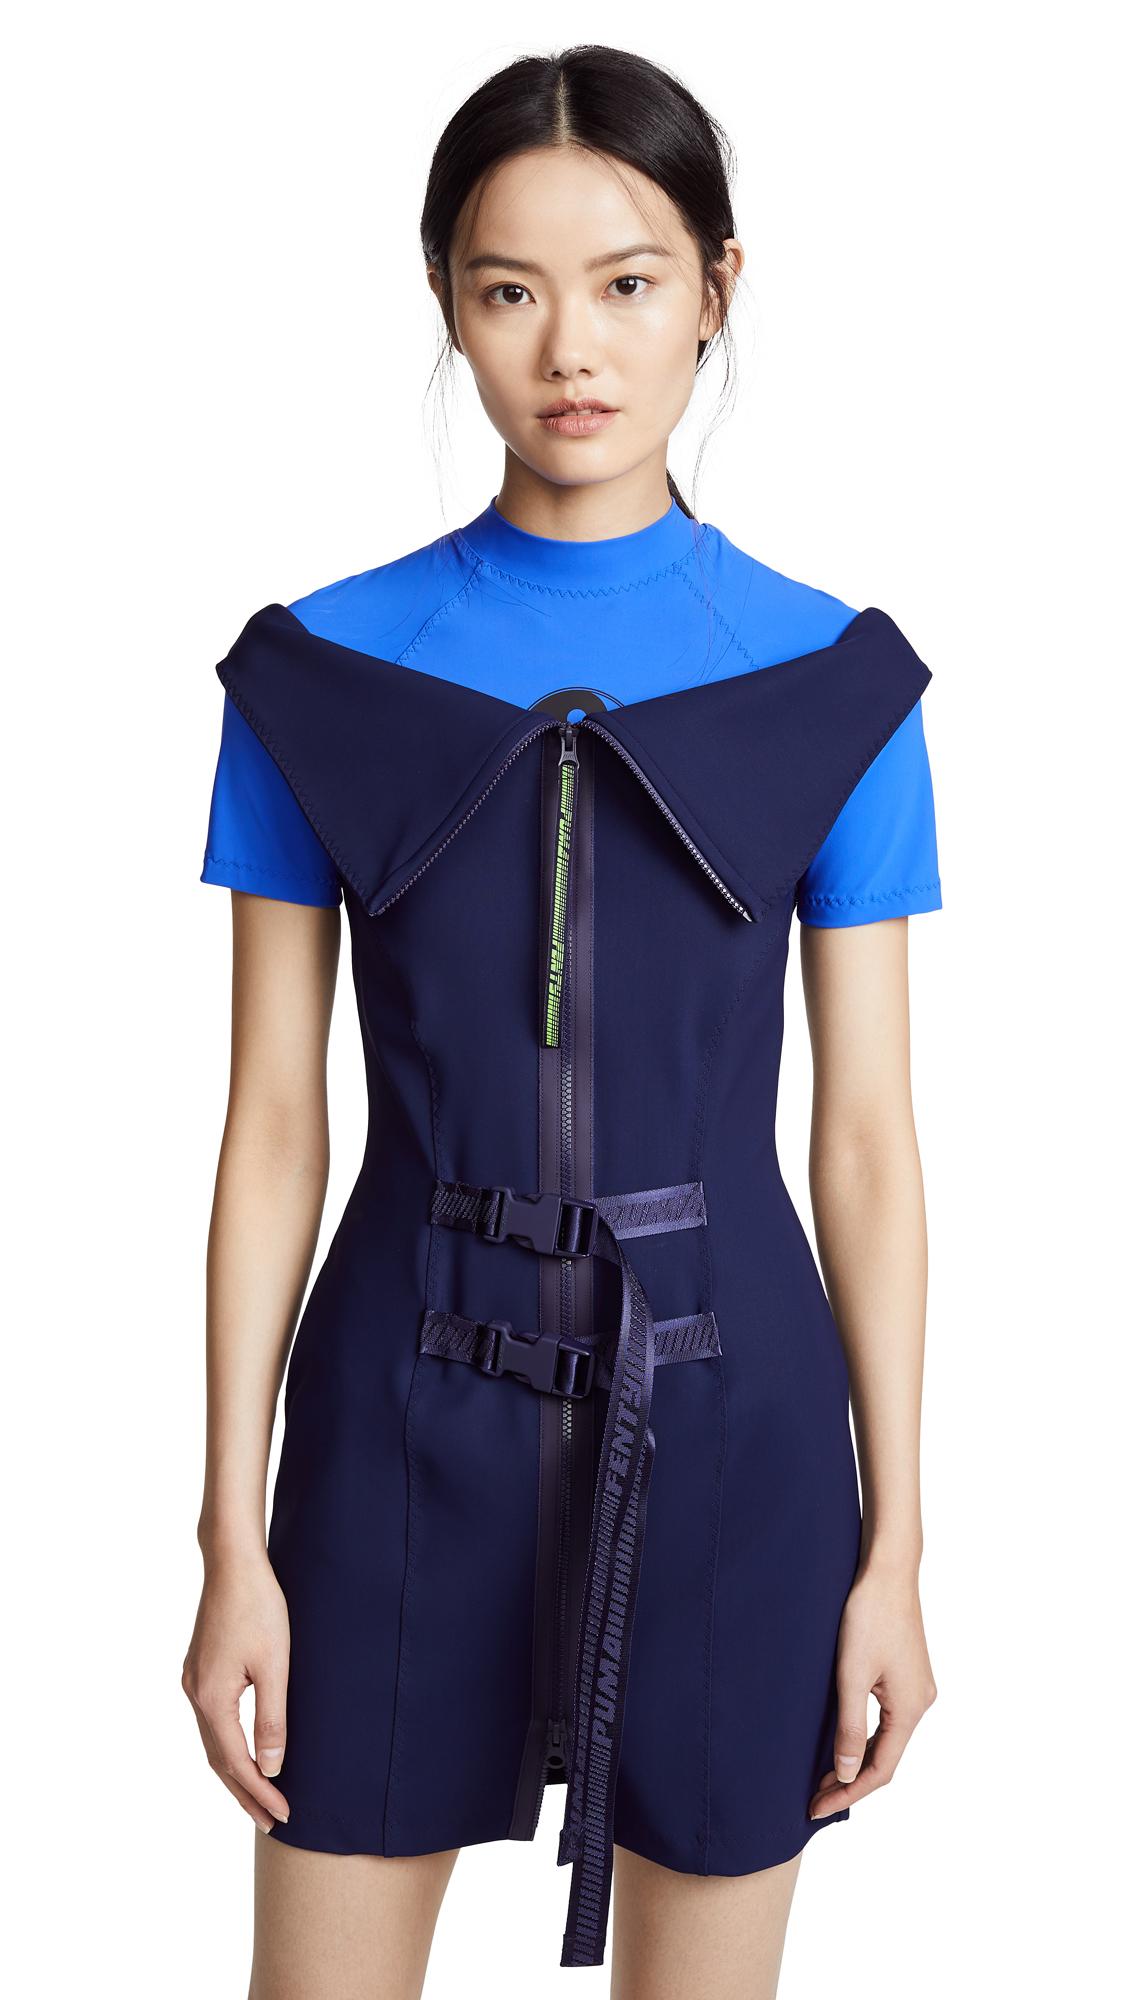 PUMA FENTY x PUMA Wetsuit Dress In Evening Blue